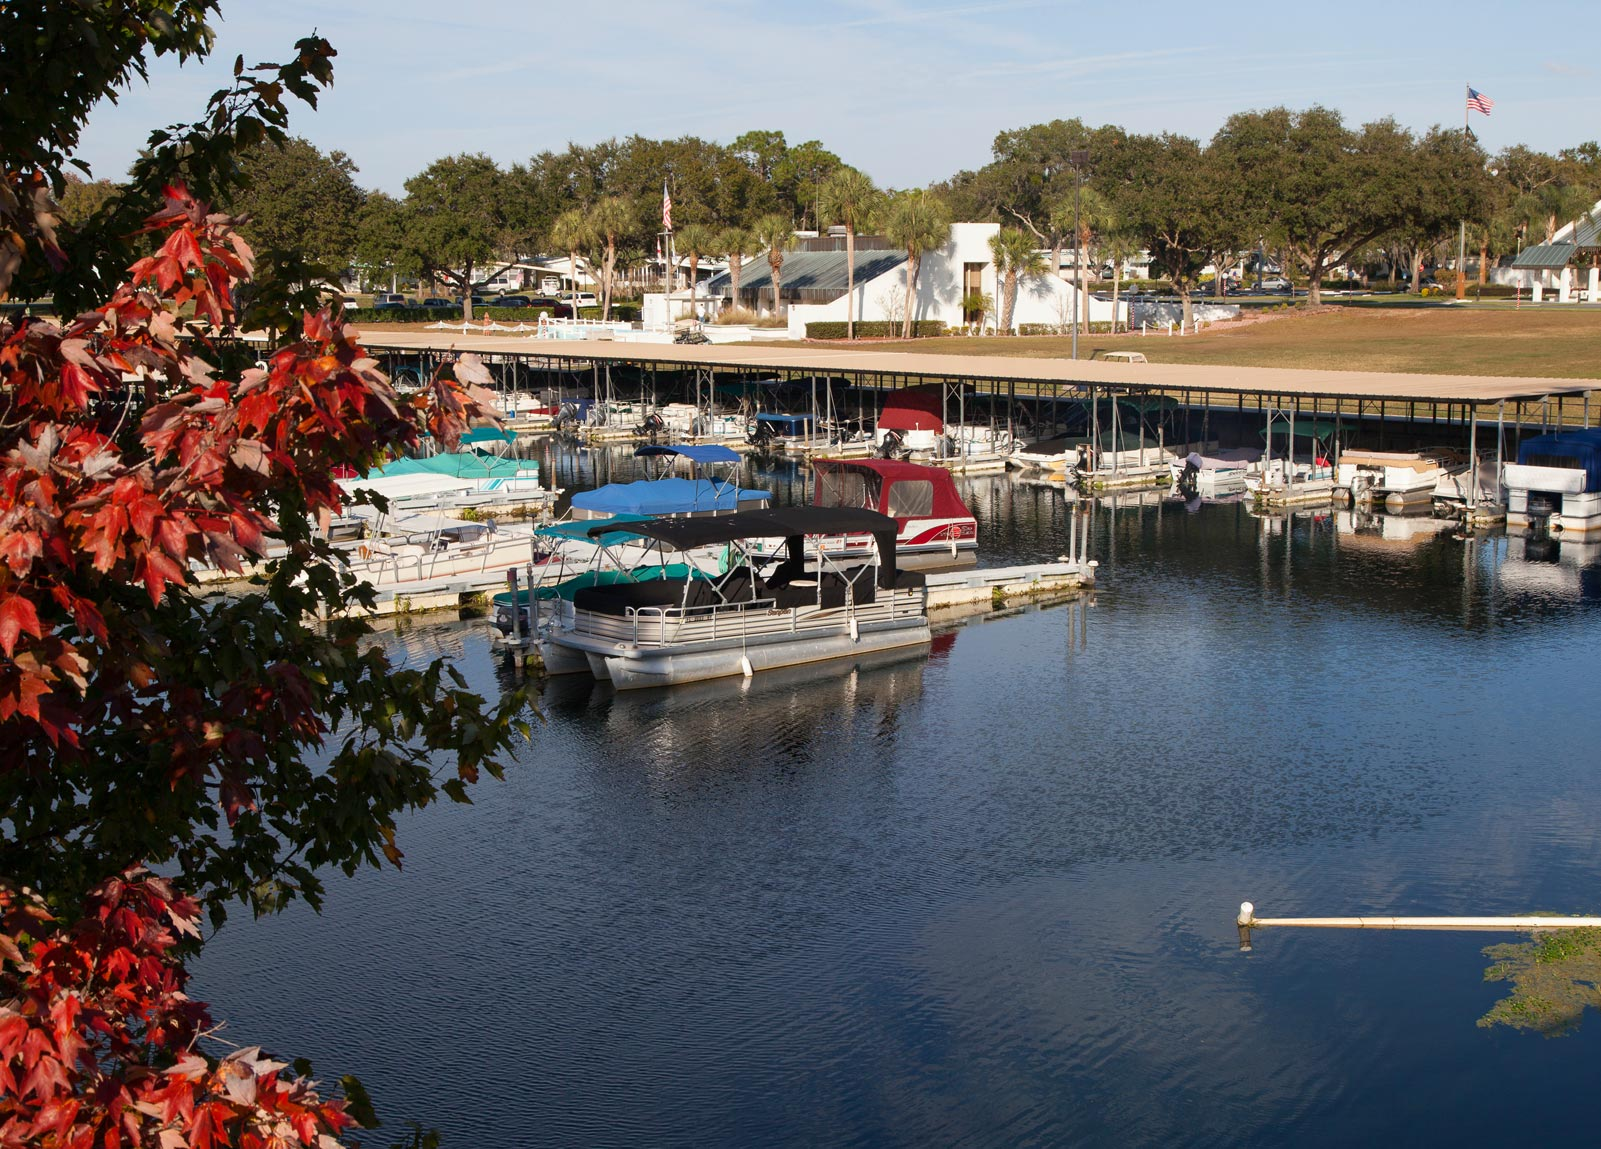 Leesburg Florida | Venetian Gardens Park | Things to do in